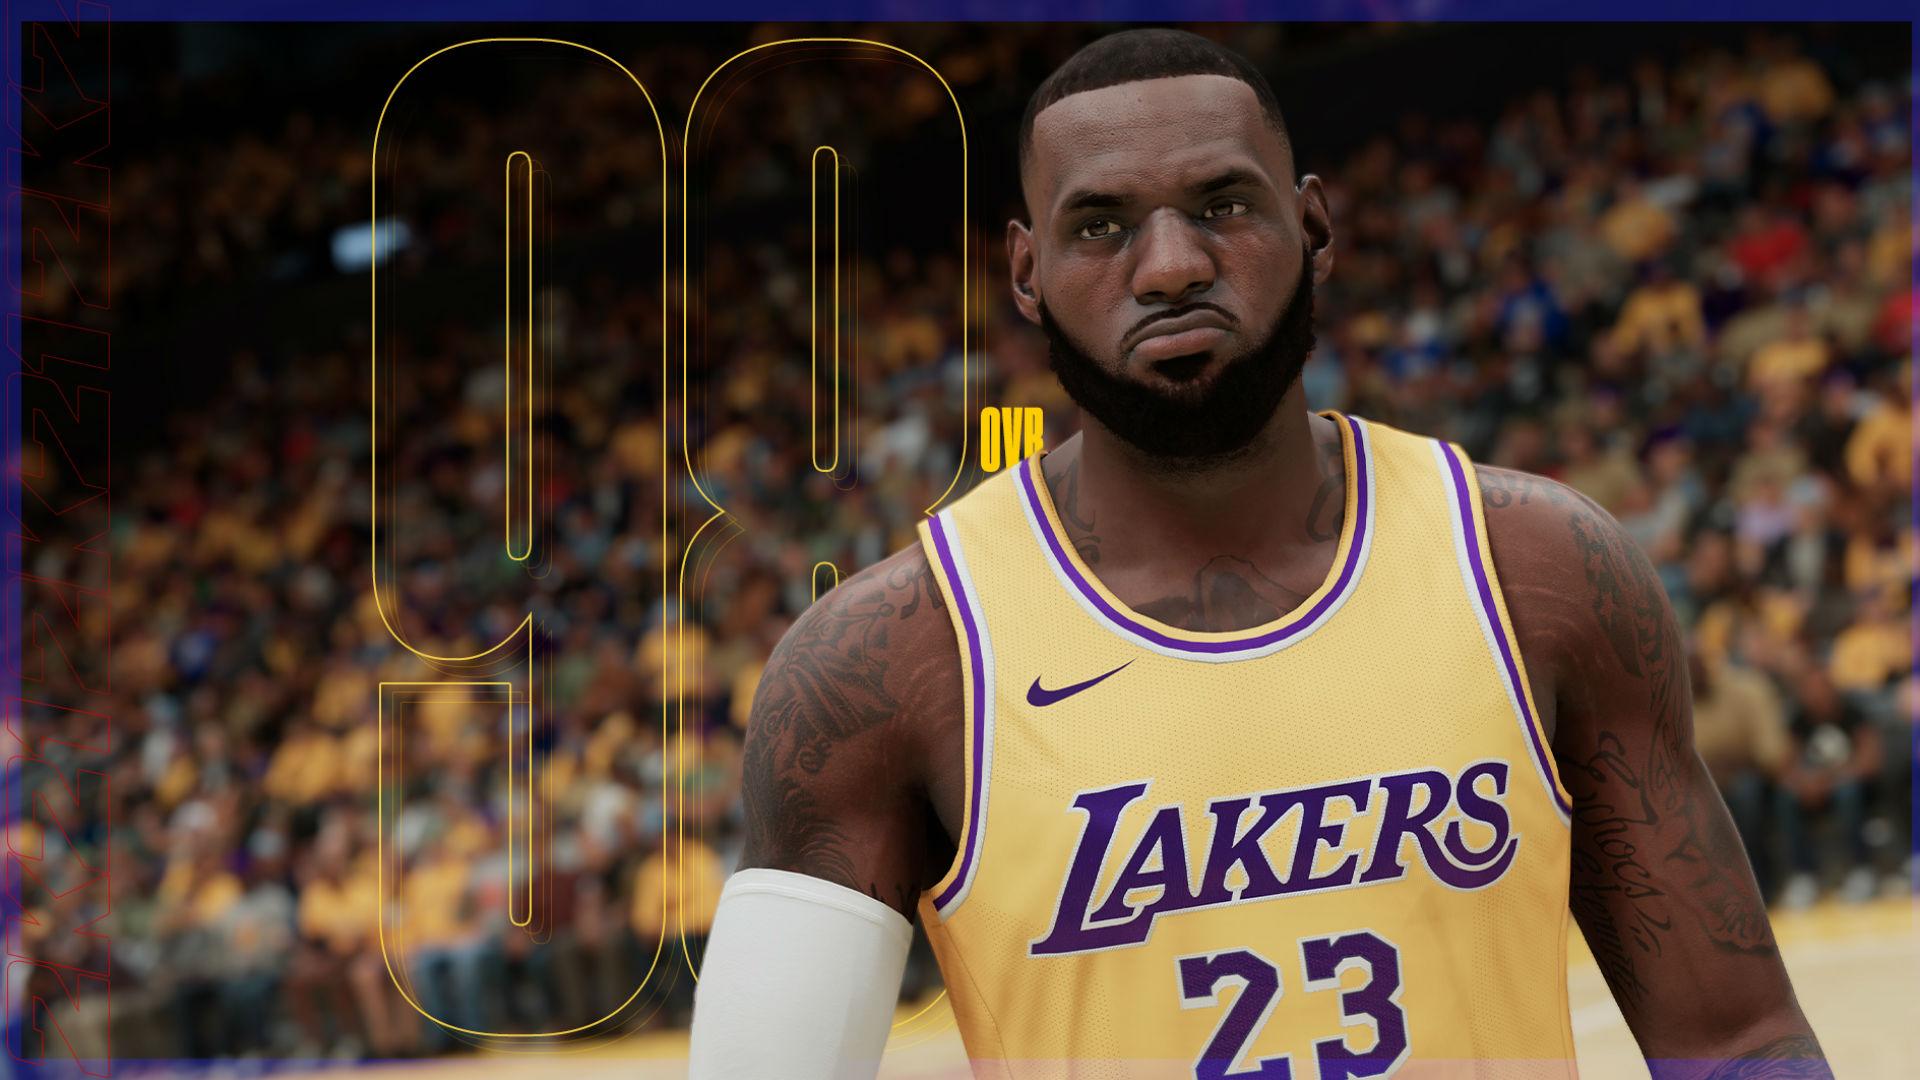 NBA 2K21' ratings: LeBron James tops